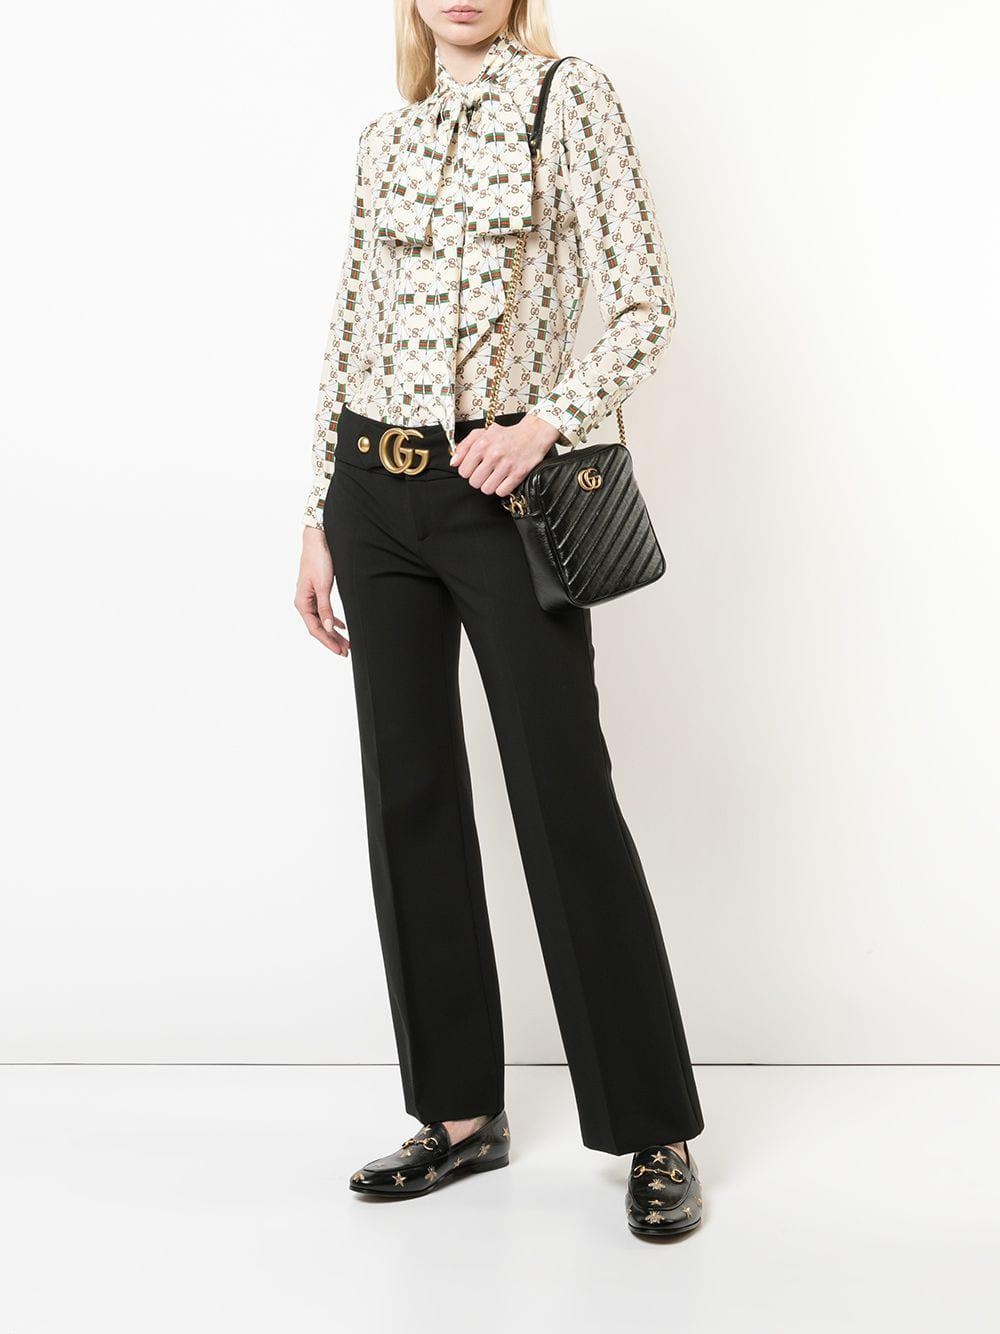 c0f629099f Gucci GG Marmont Mini Shoulder Bag in Black - Lyst